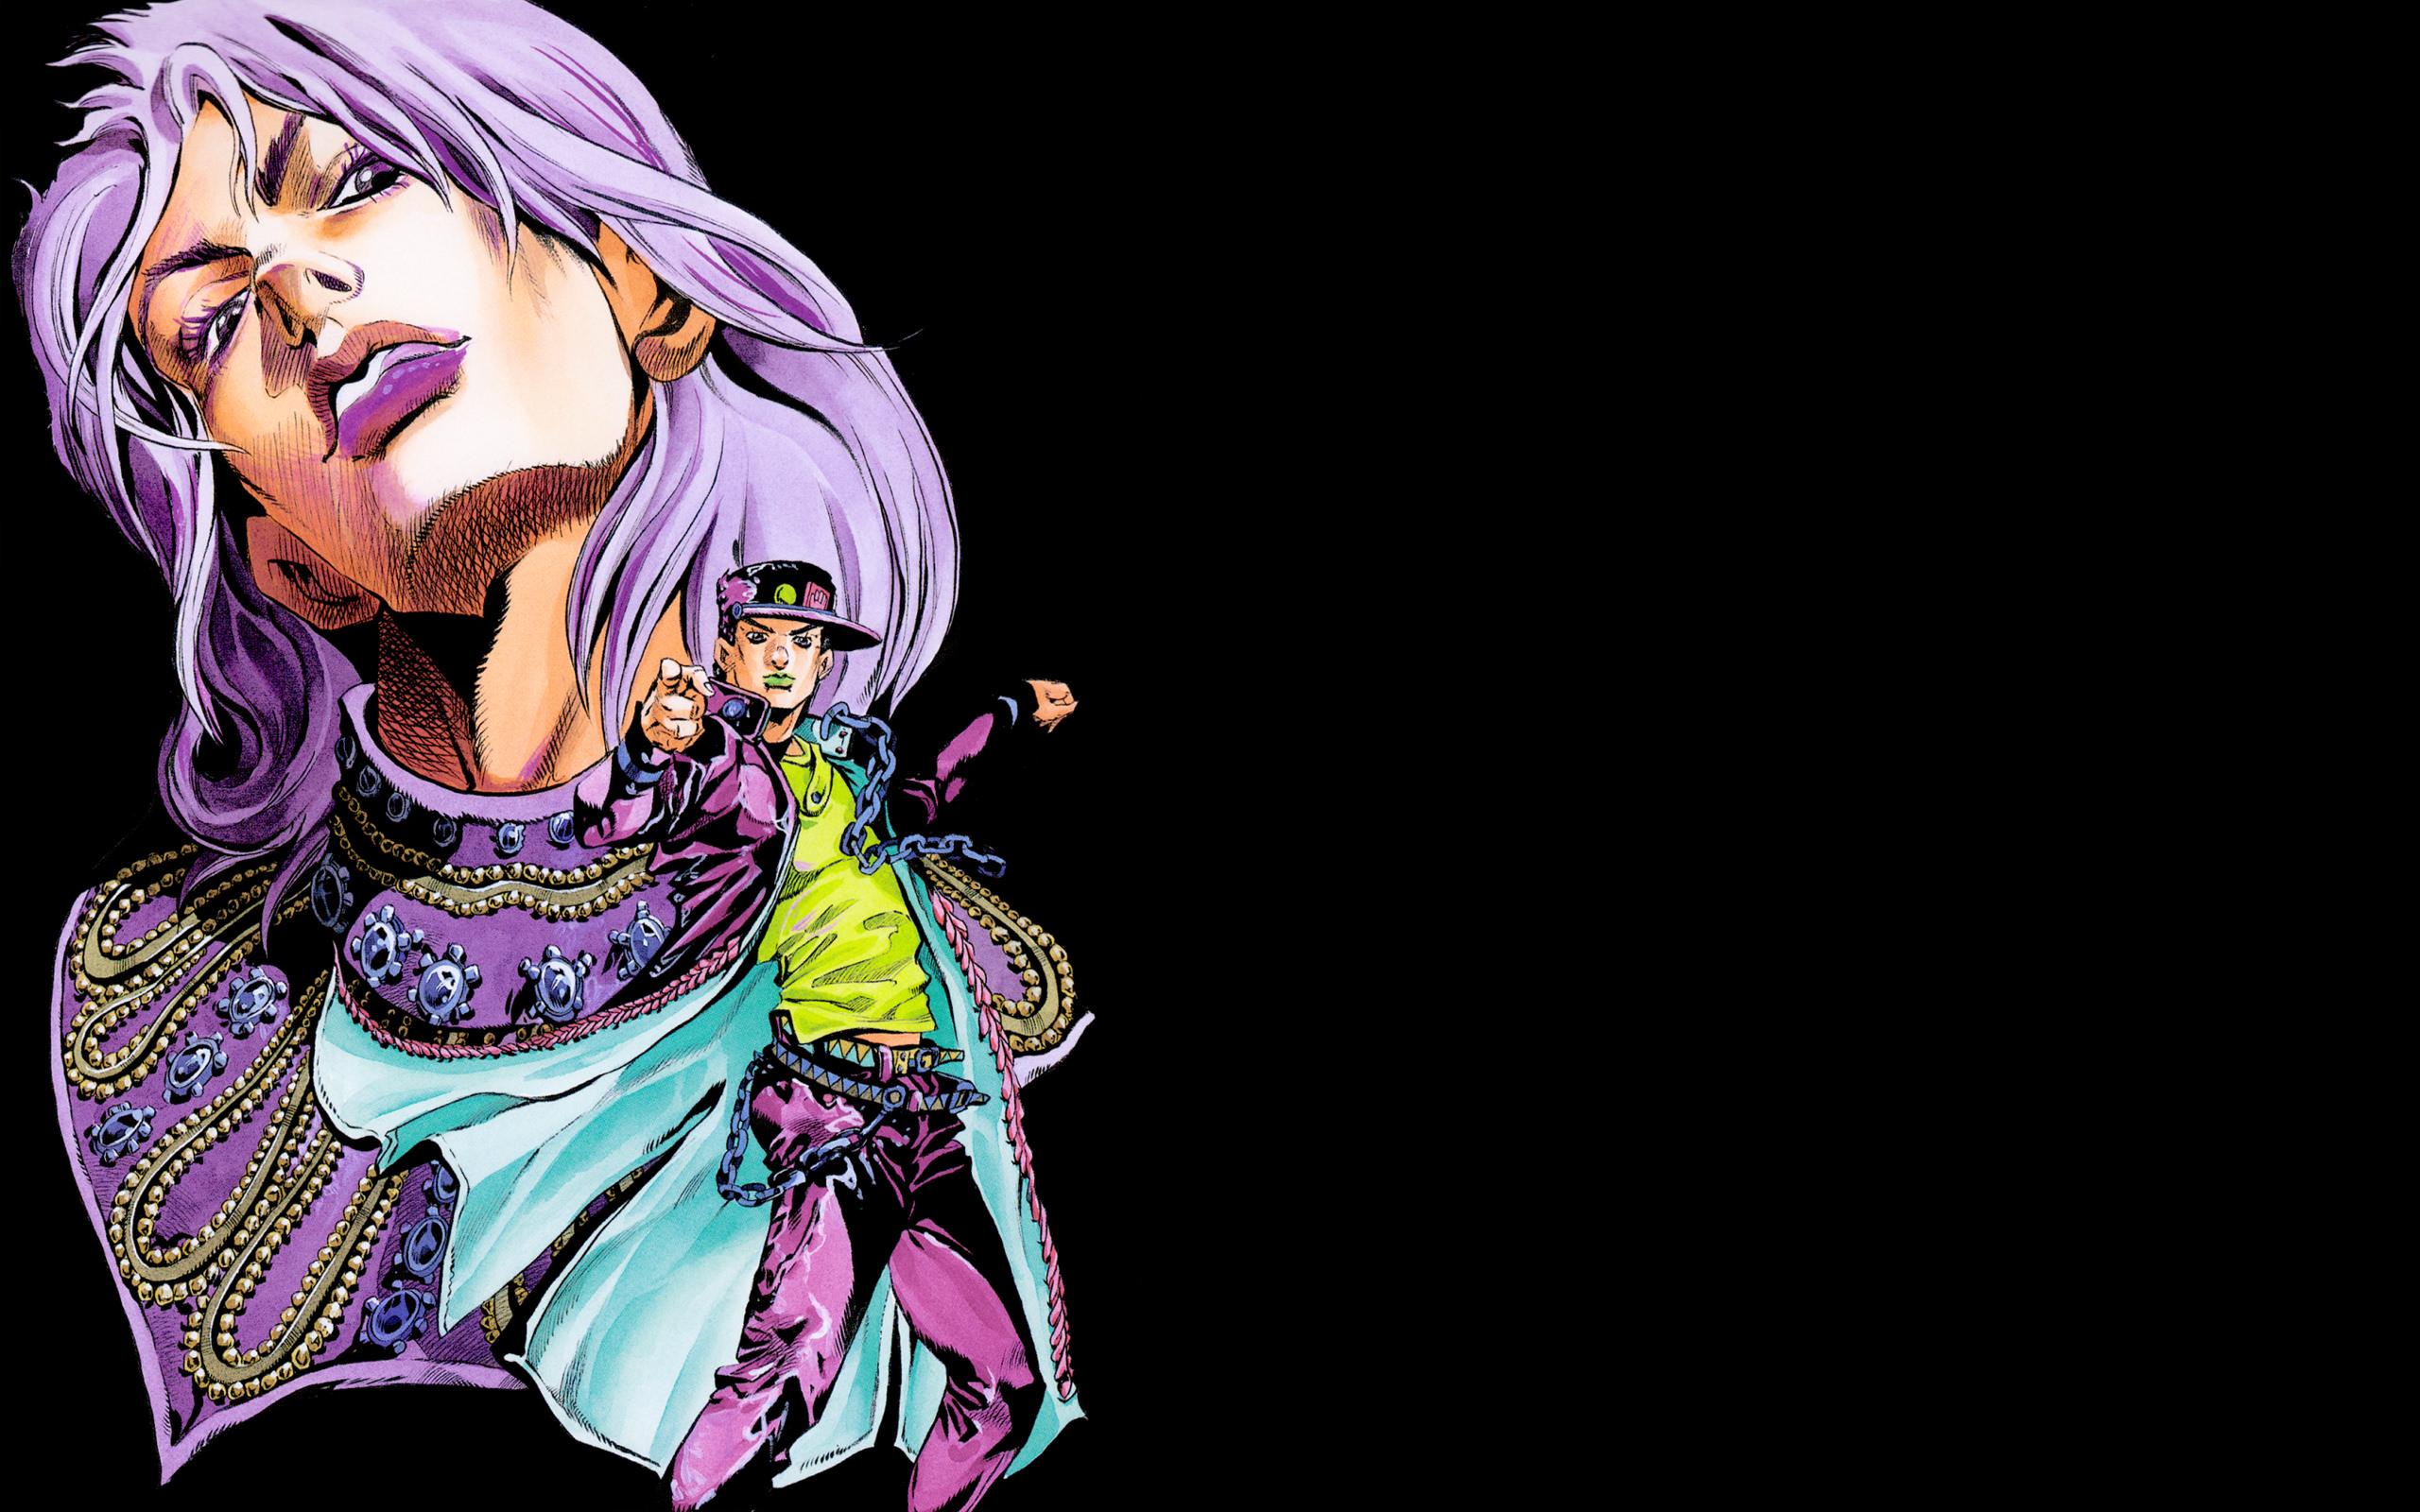 Wallpaper Jojo S Bizarre Adventure Jojo Anime Manga Hirohiko Araki Jotaro Kujo Jojo S Bizarre Adventure Stardust Crusaders Stardust Crusaders 2560x1600 Fuhrersparkle 1595787 Hd Wallpapers Wallhere